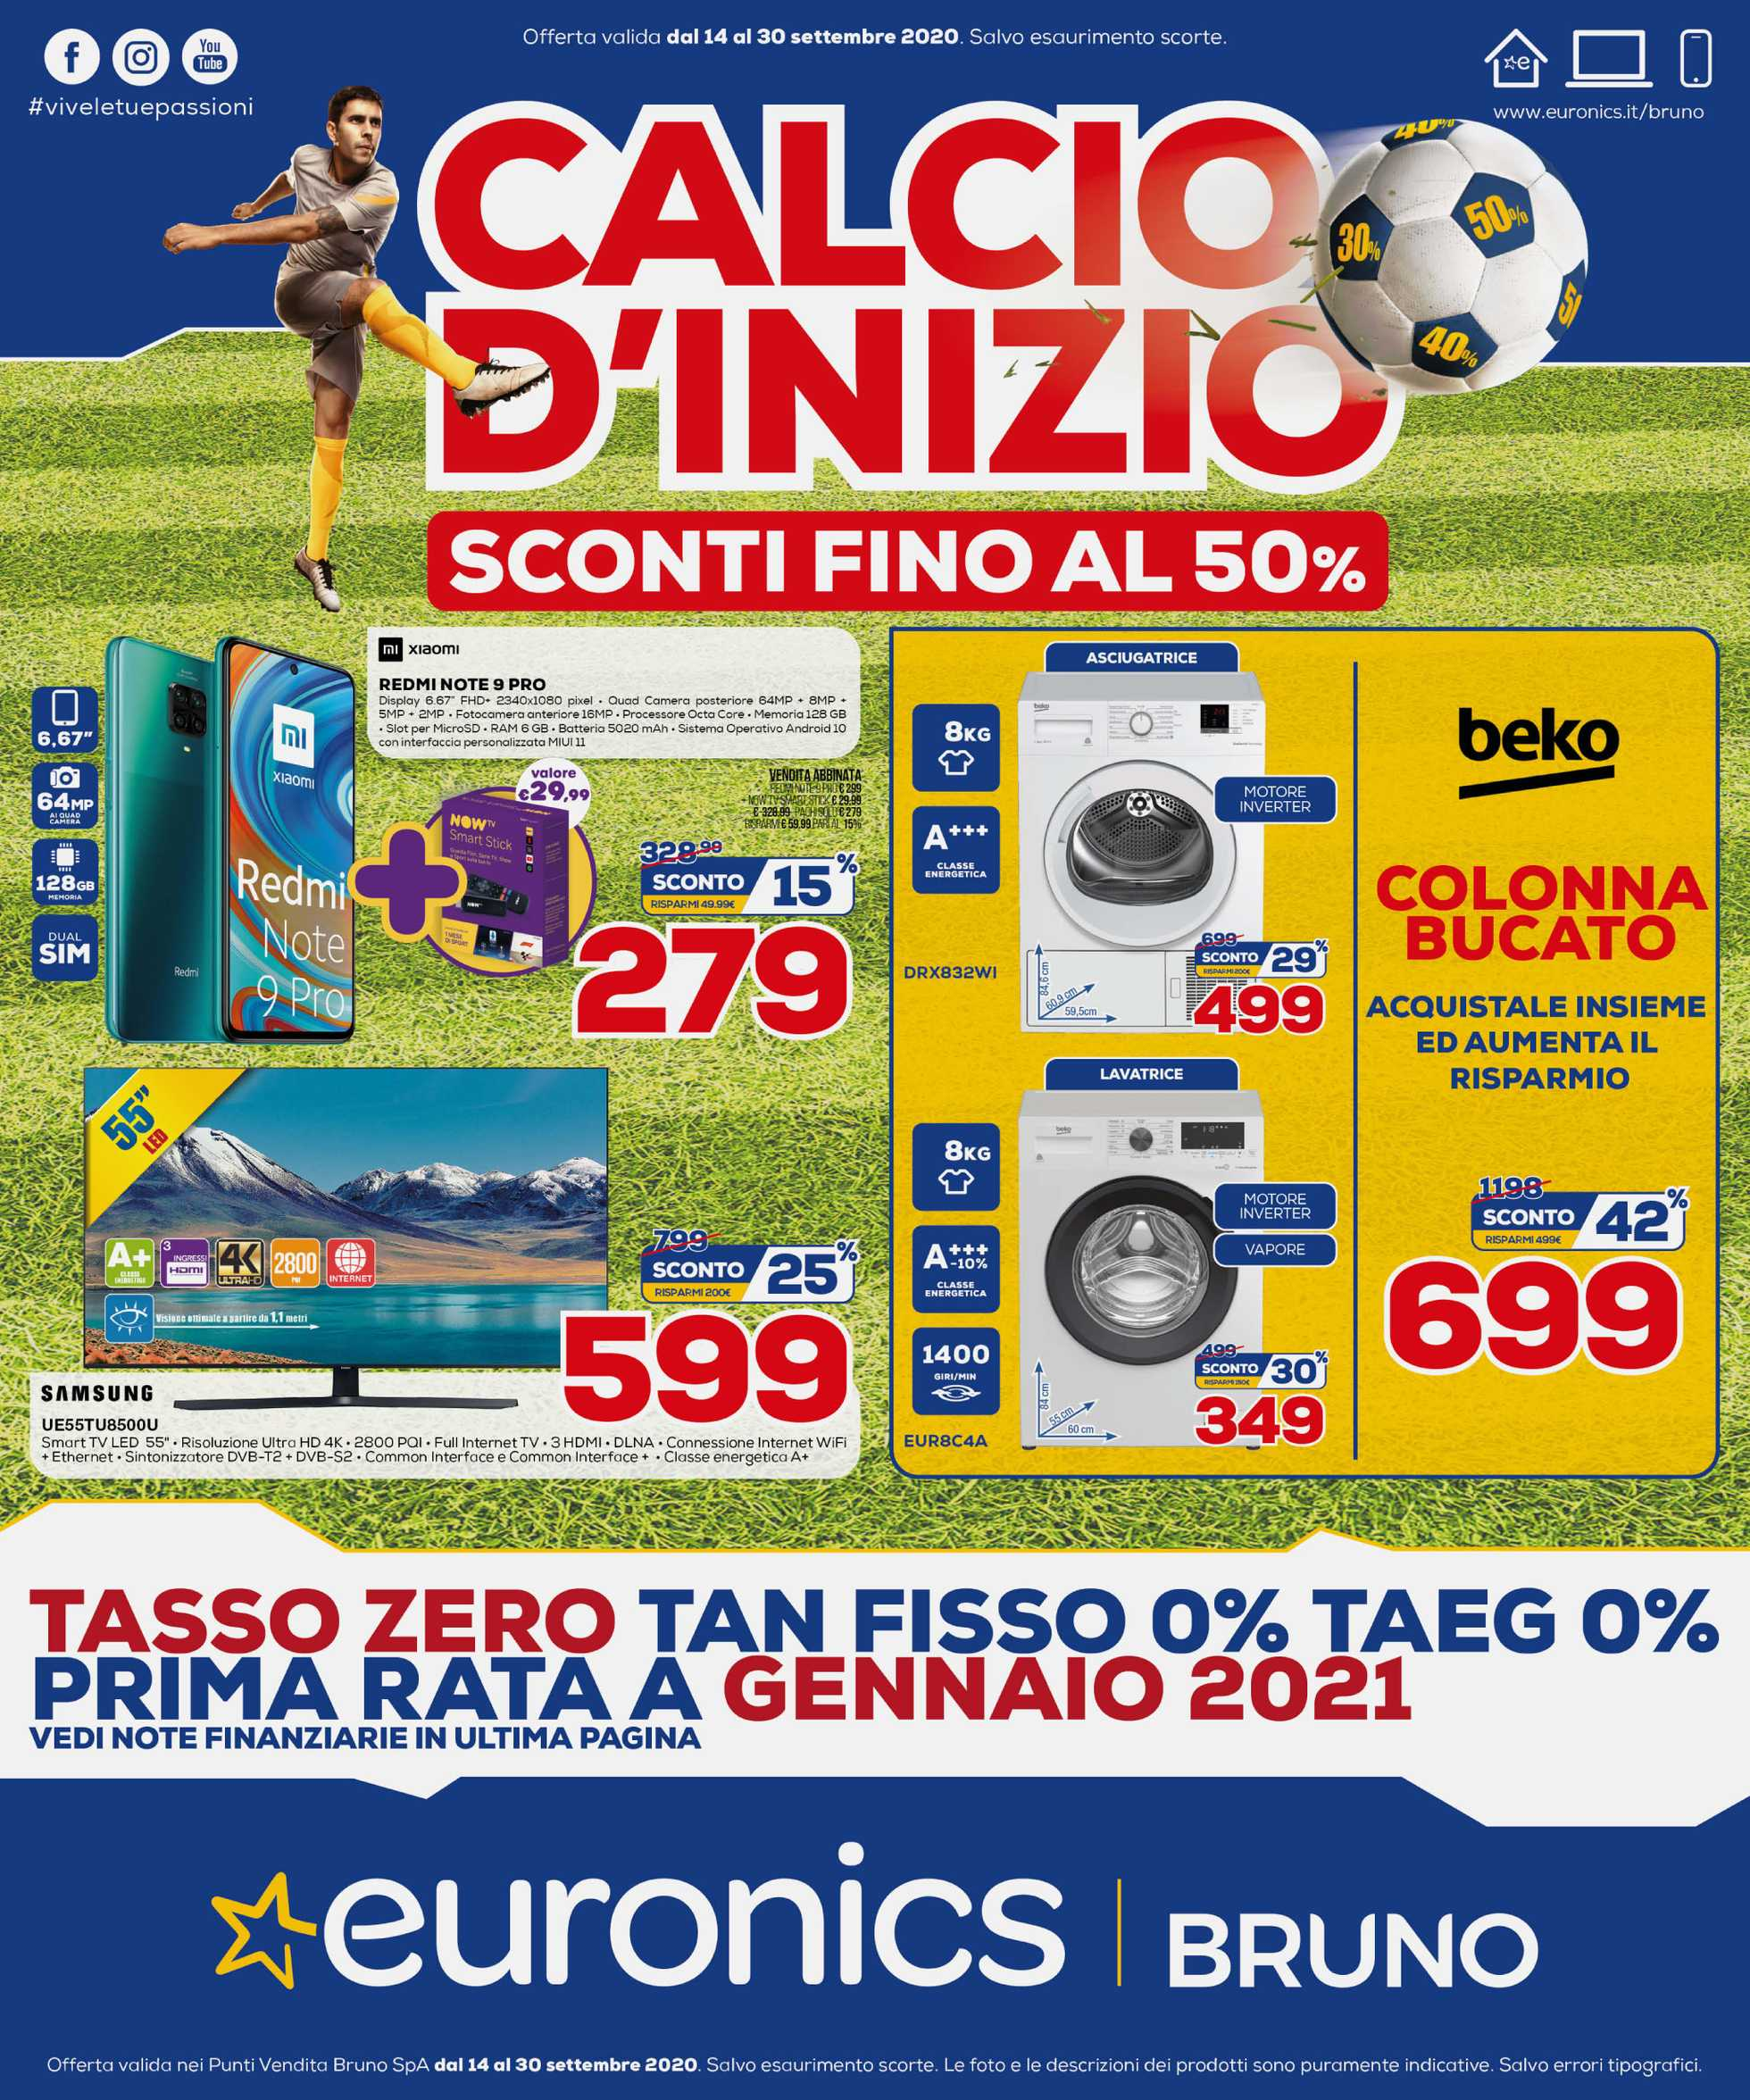 Euronics Bruno - offerte valide dal 14.09.2020 al 30.09.2020 - pagina 1.